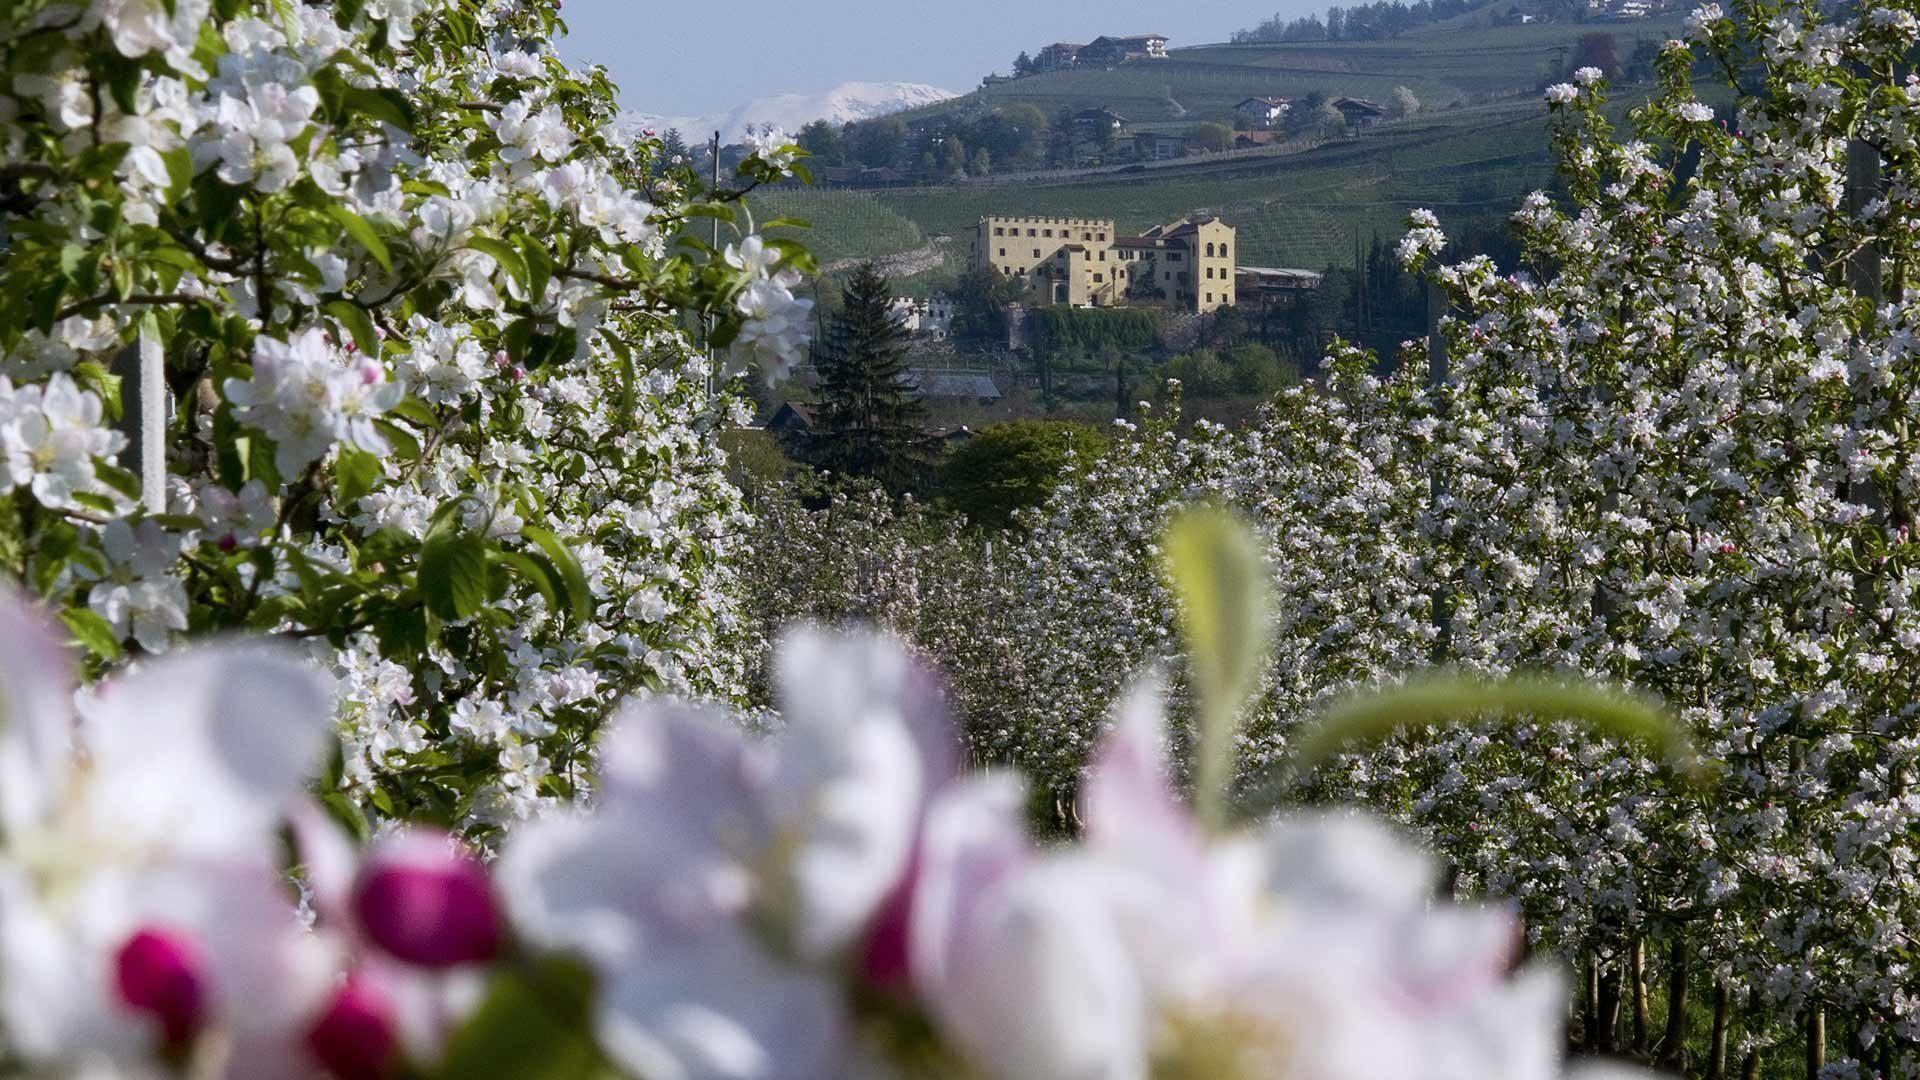 Passeggiate tra i meleti in fiore